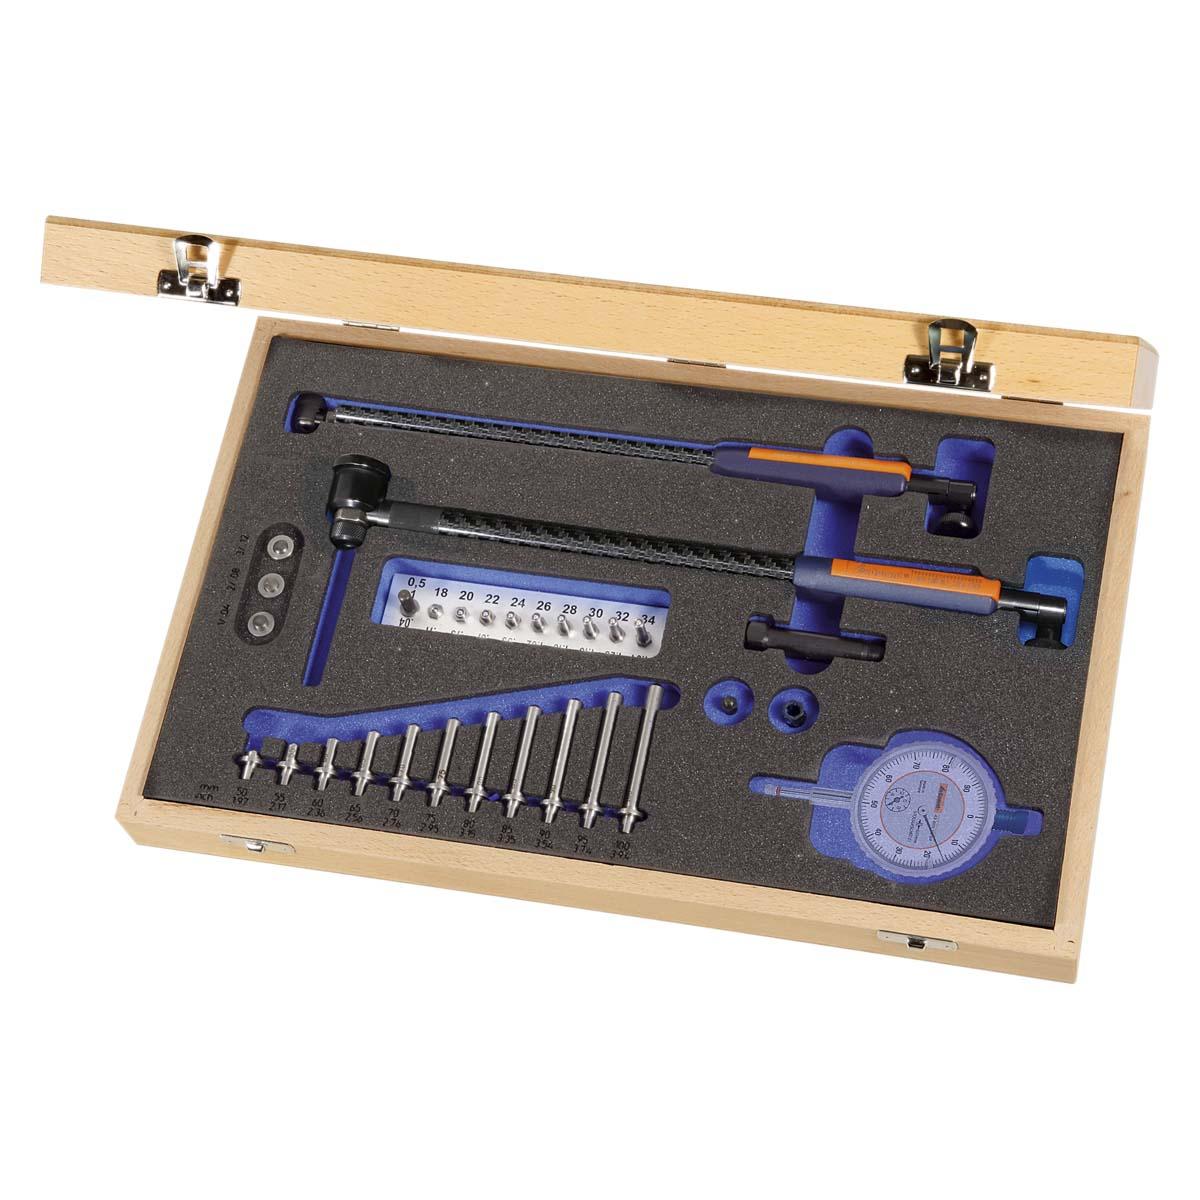 Juego de verificadores de interiores de precisión 18-150 mm GARANT